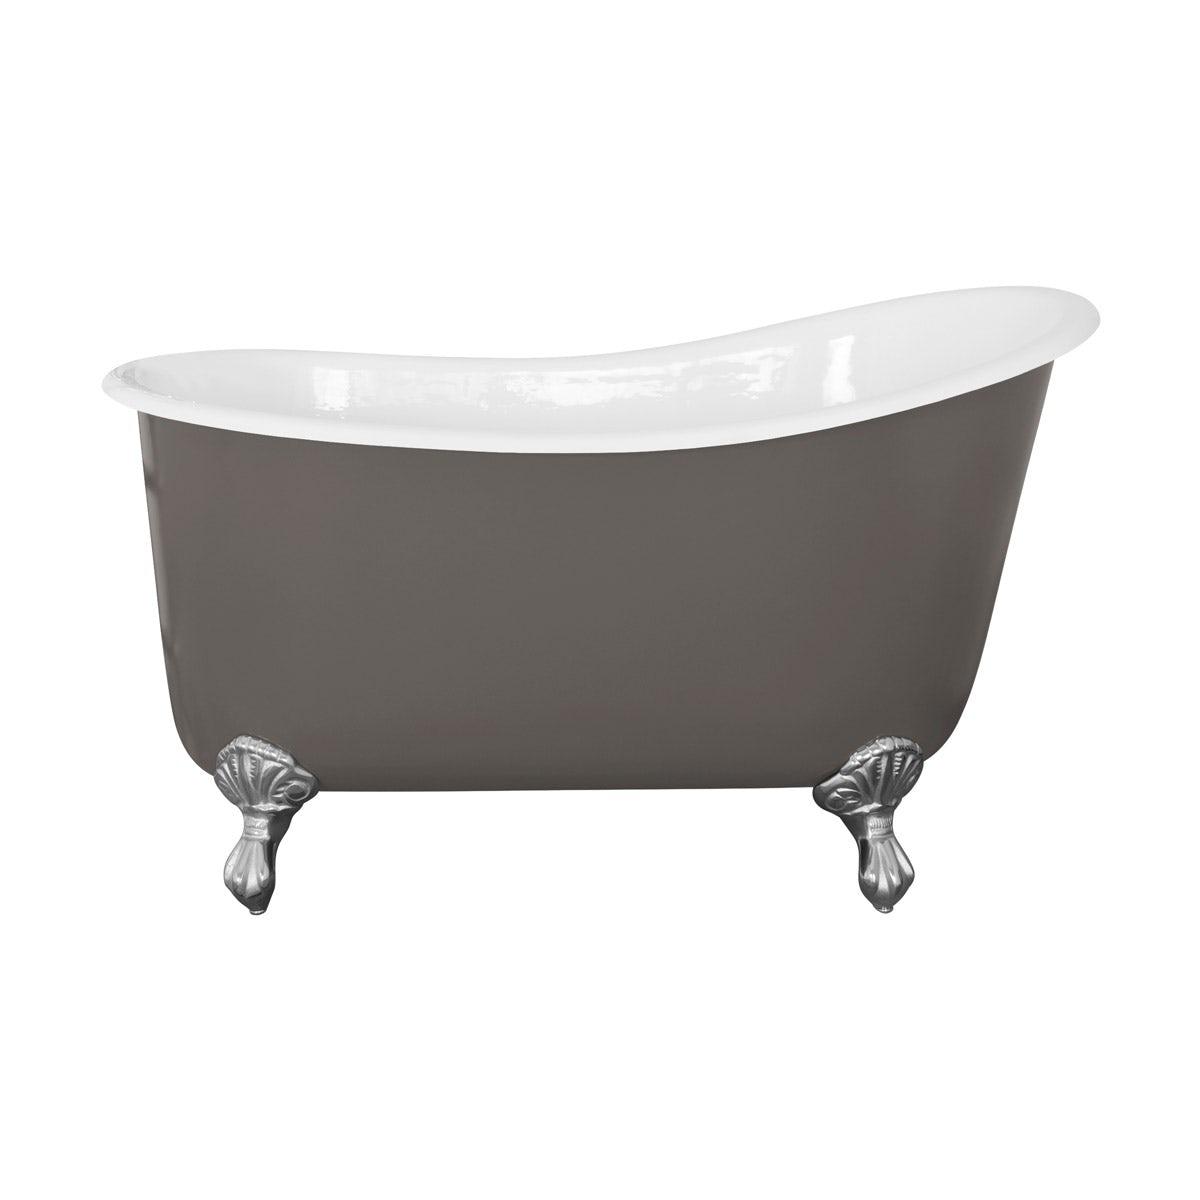 The Bath Co. Berkeley keystone grey cast iron bath